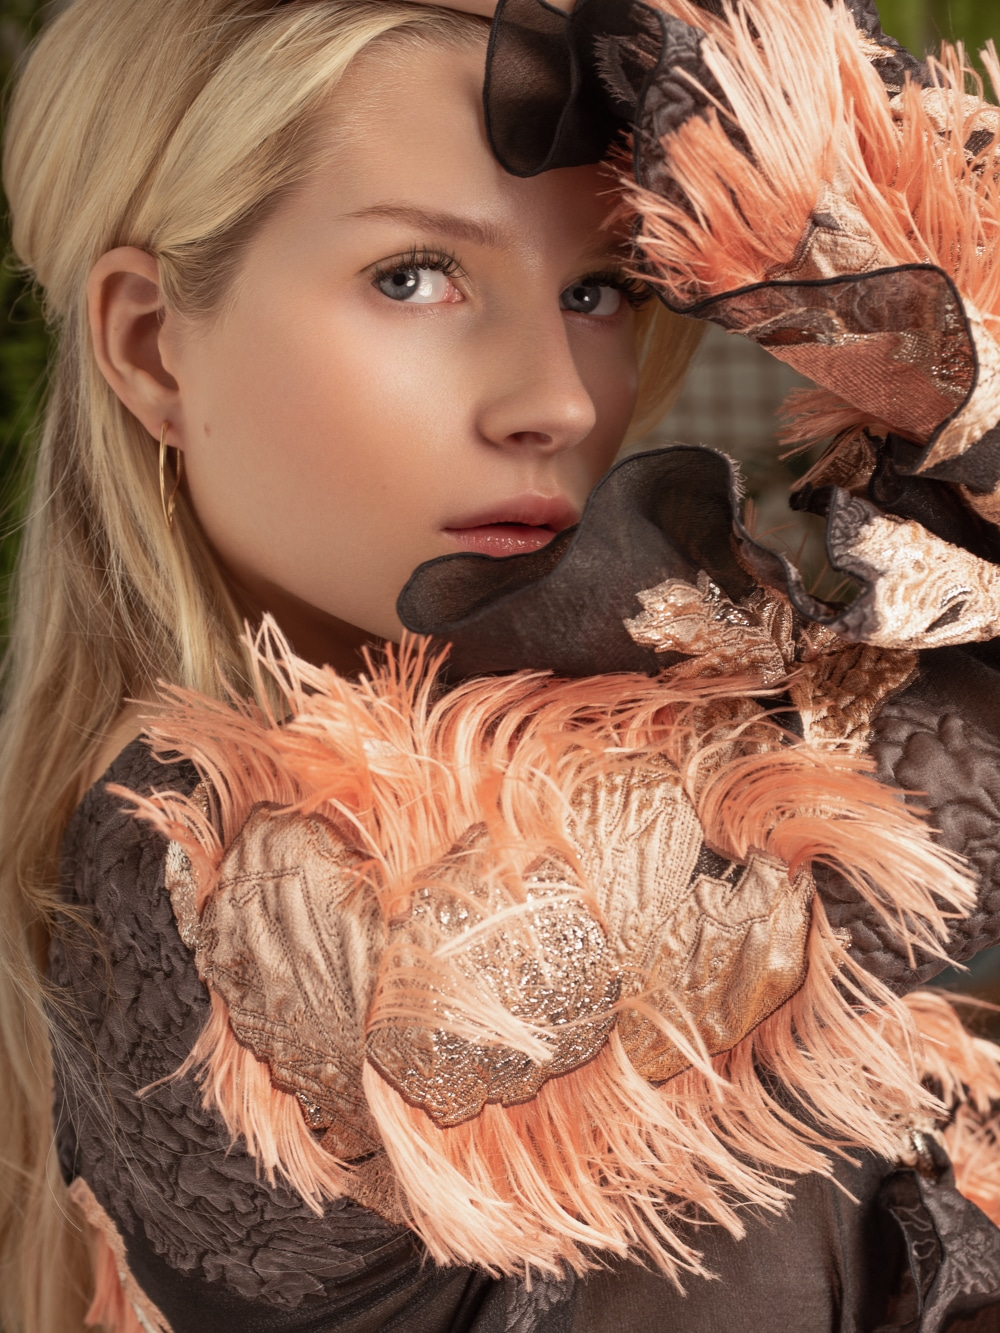 Lottie-Moss-ELLE-Bulgaria-October-2018-Anna-Zesiger-7.jpg